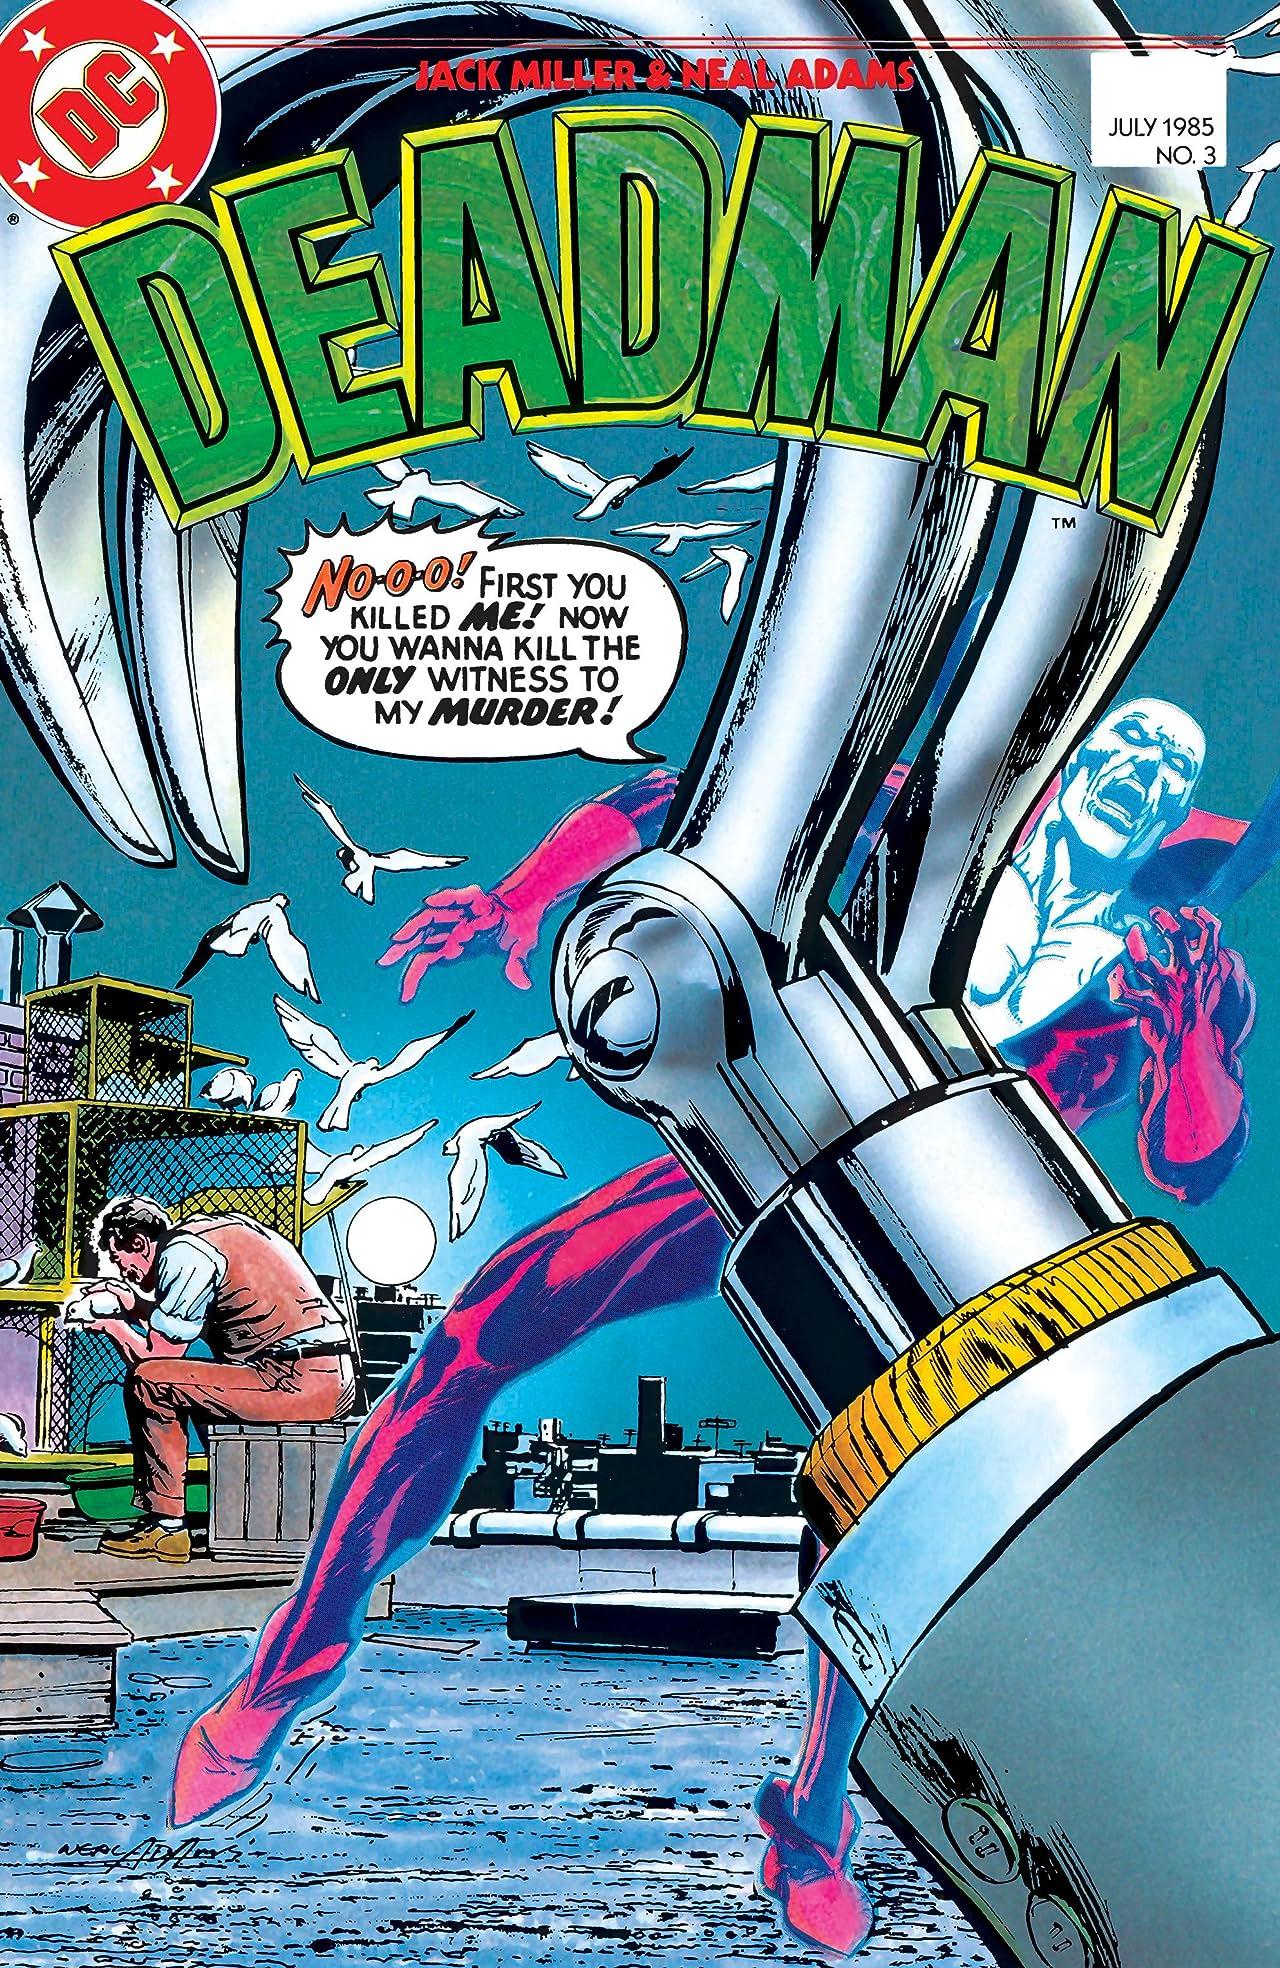 Deadman (1985) #3